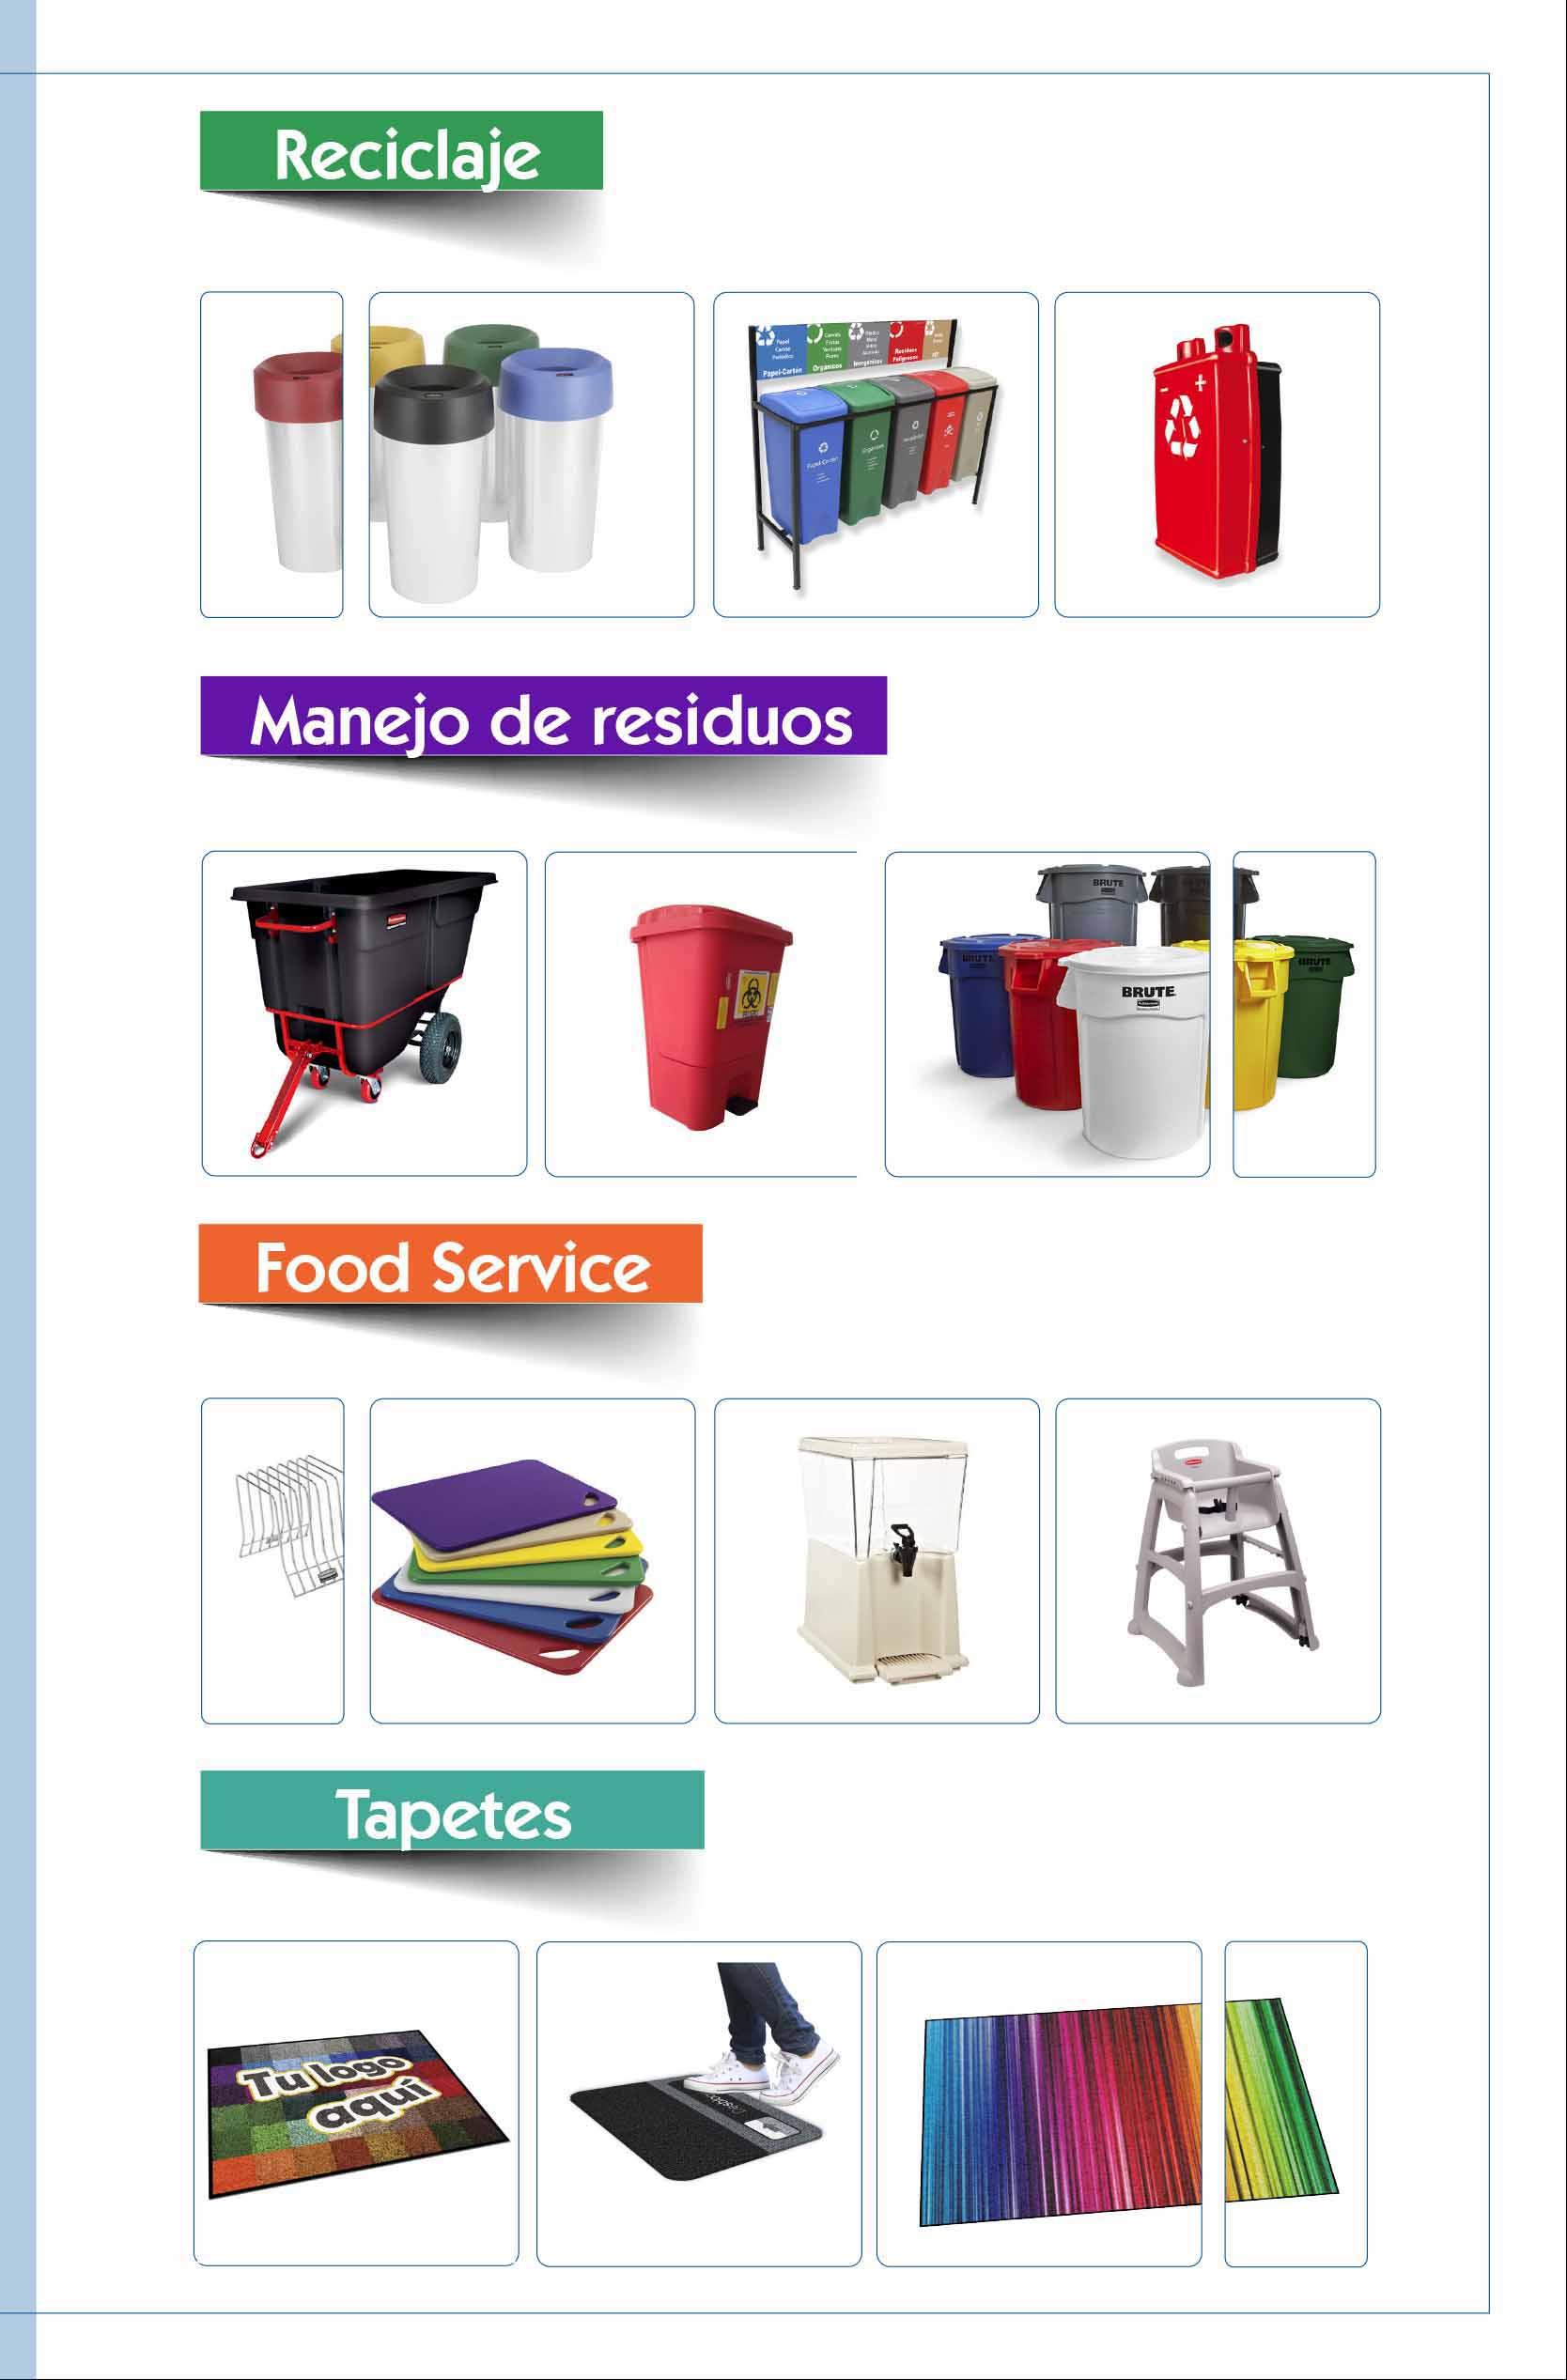 produtos-reciclaje.jpg